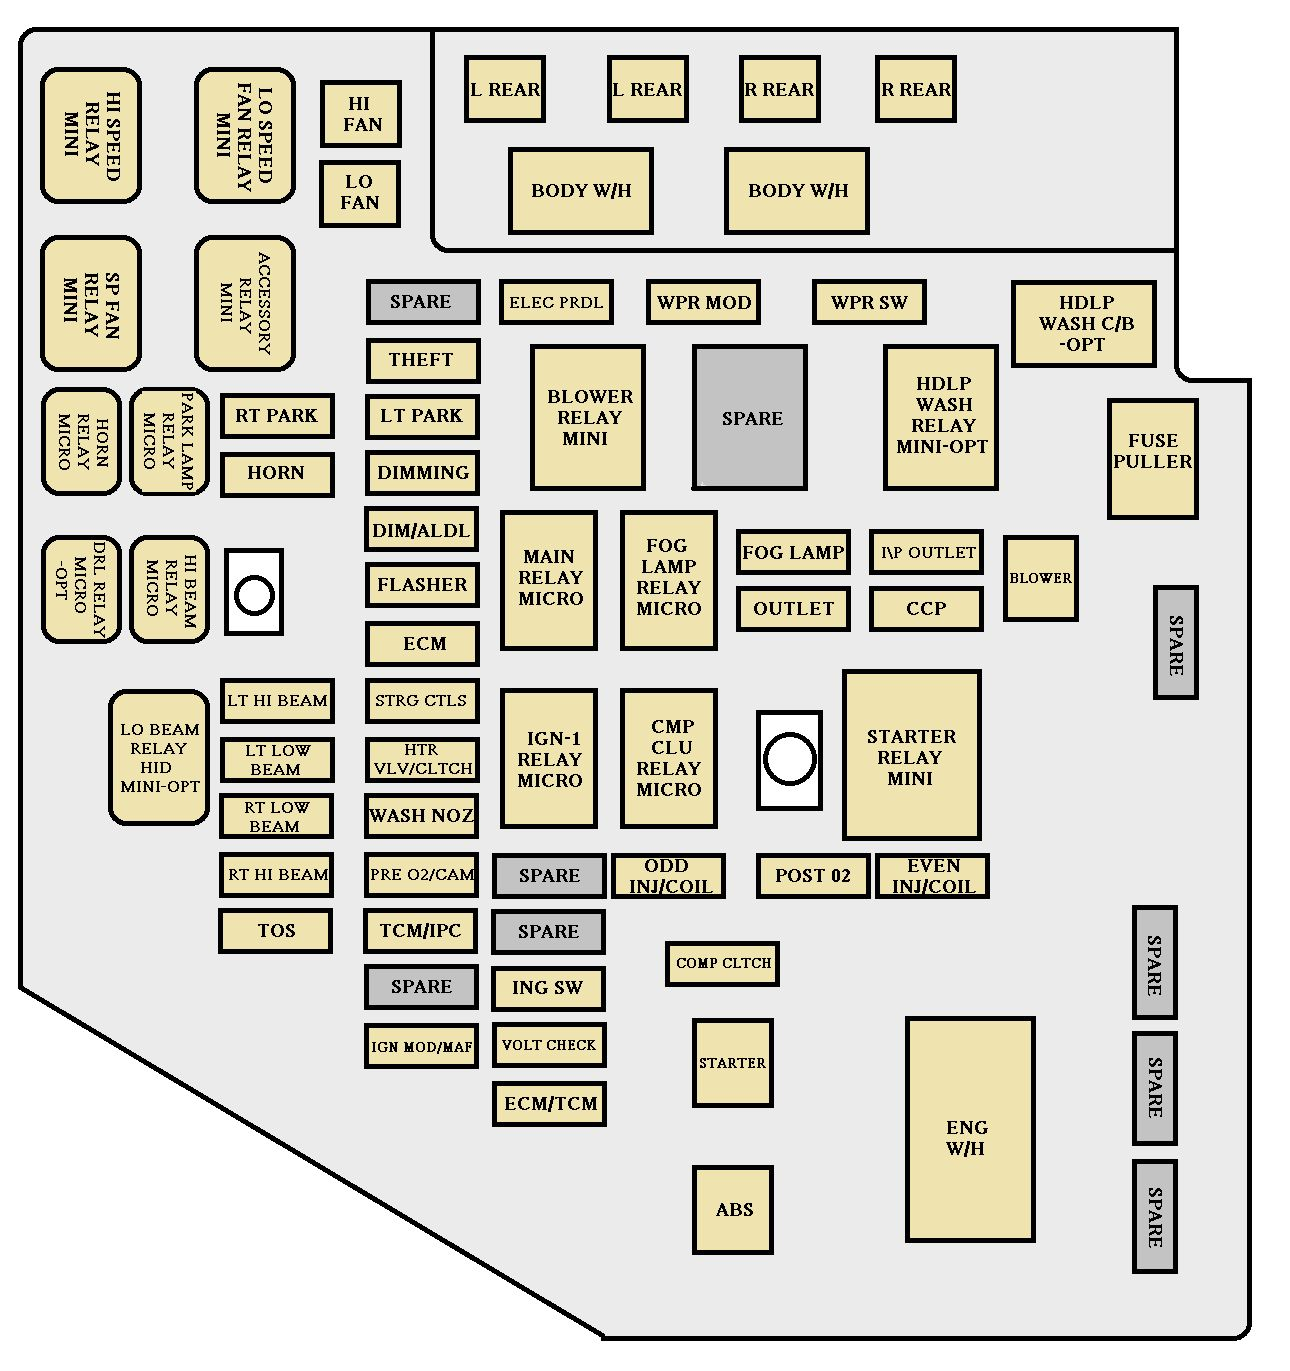 2003 Cadillac Cts Fuse Box Diagram Wiring Diagrams Data Schema 2000 Escalade Schematic